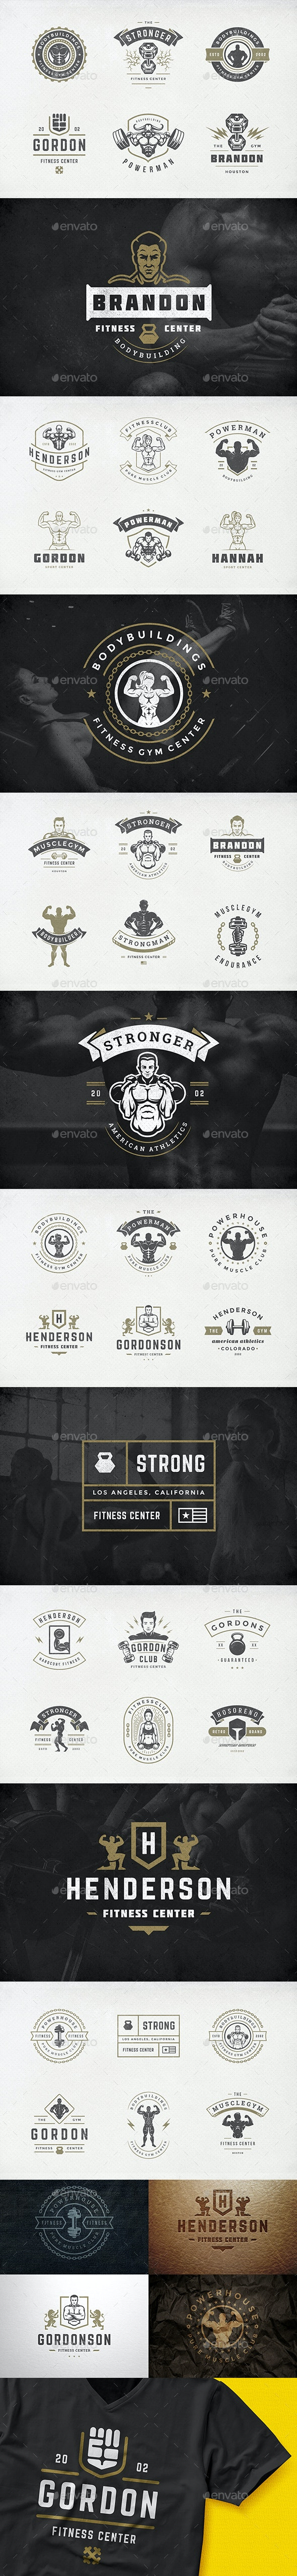 Retro Fitness & Gym Logos Set - Badges & Stickers Web Elements